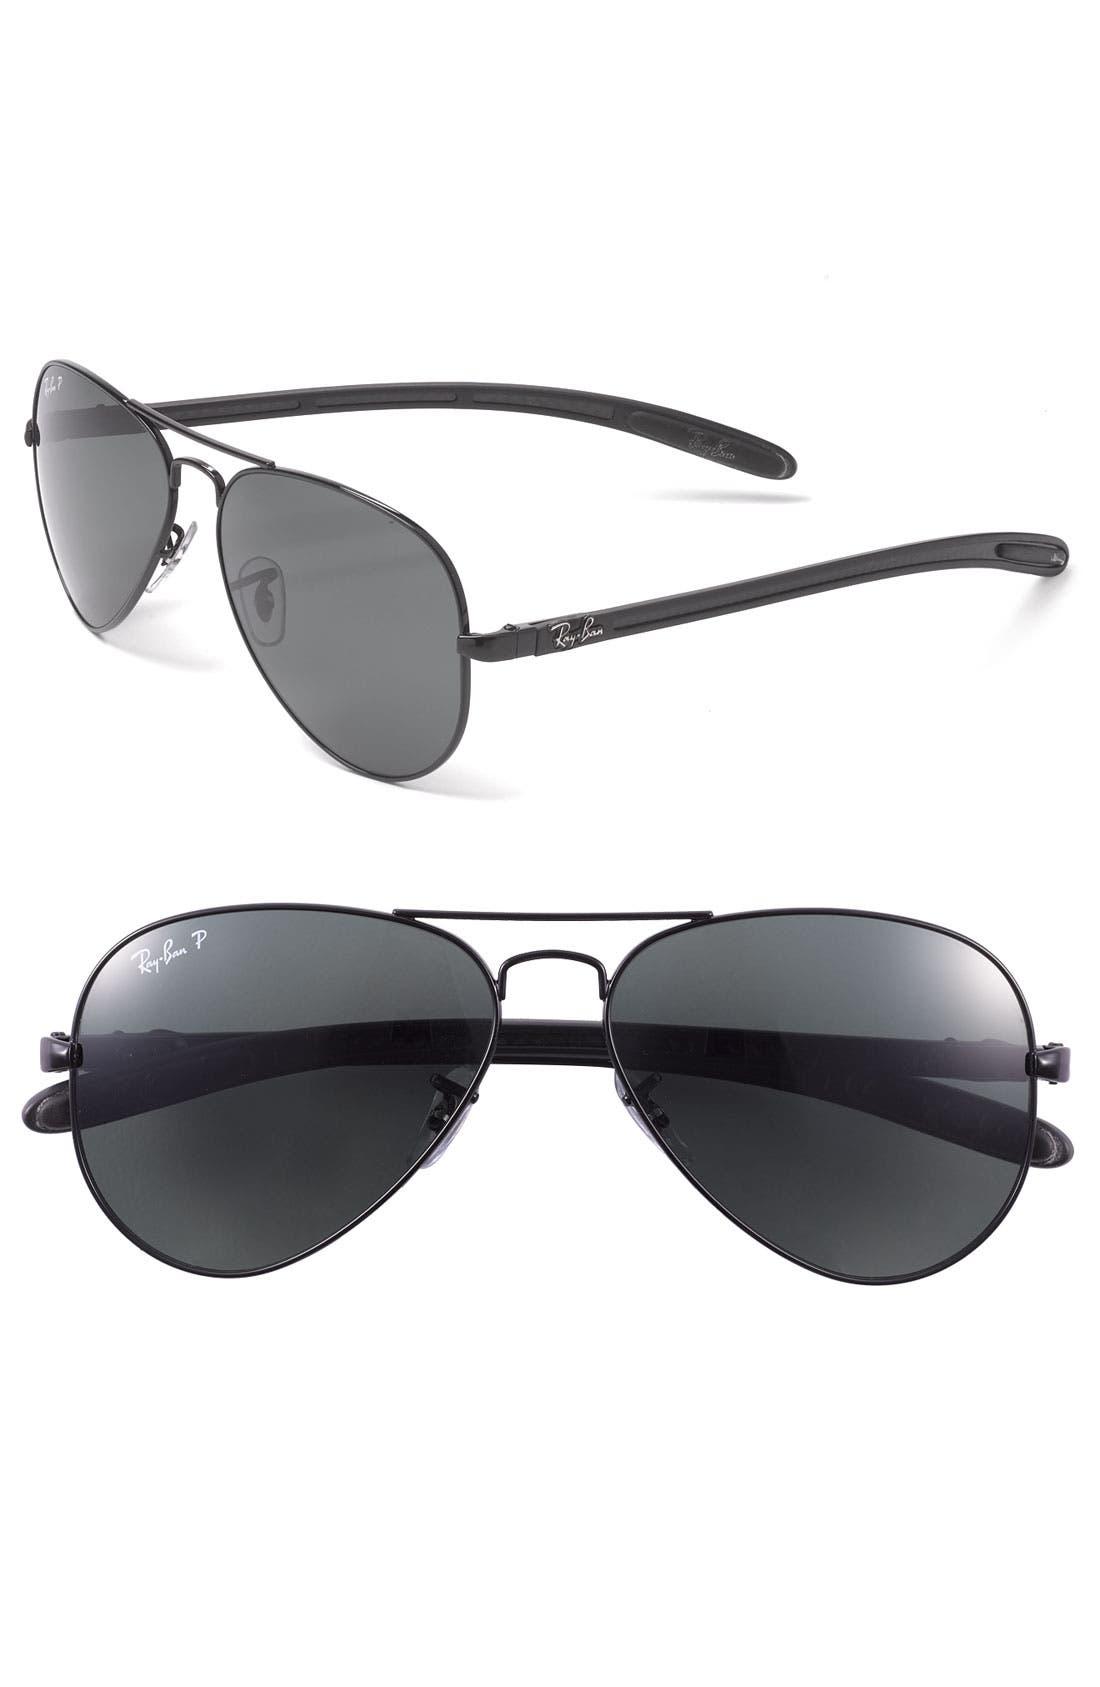 Main Image - Ray-Ban 'Tech' Polarized 58mm Aviator Sunglasses